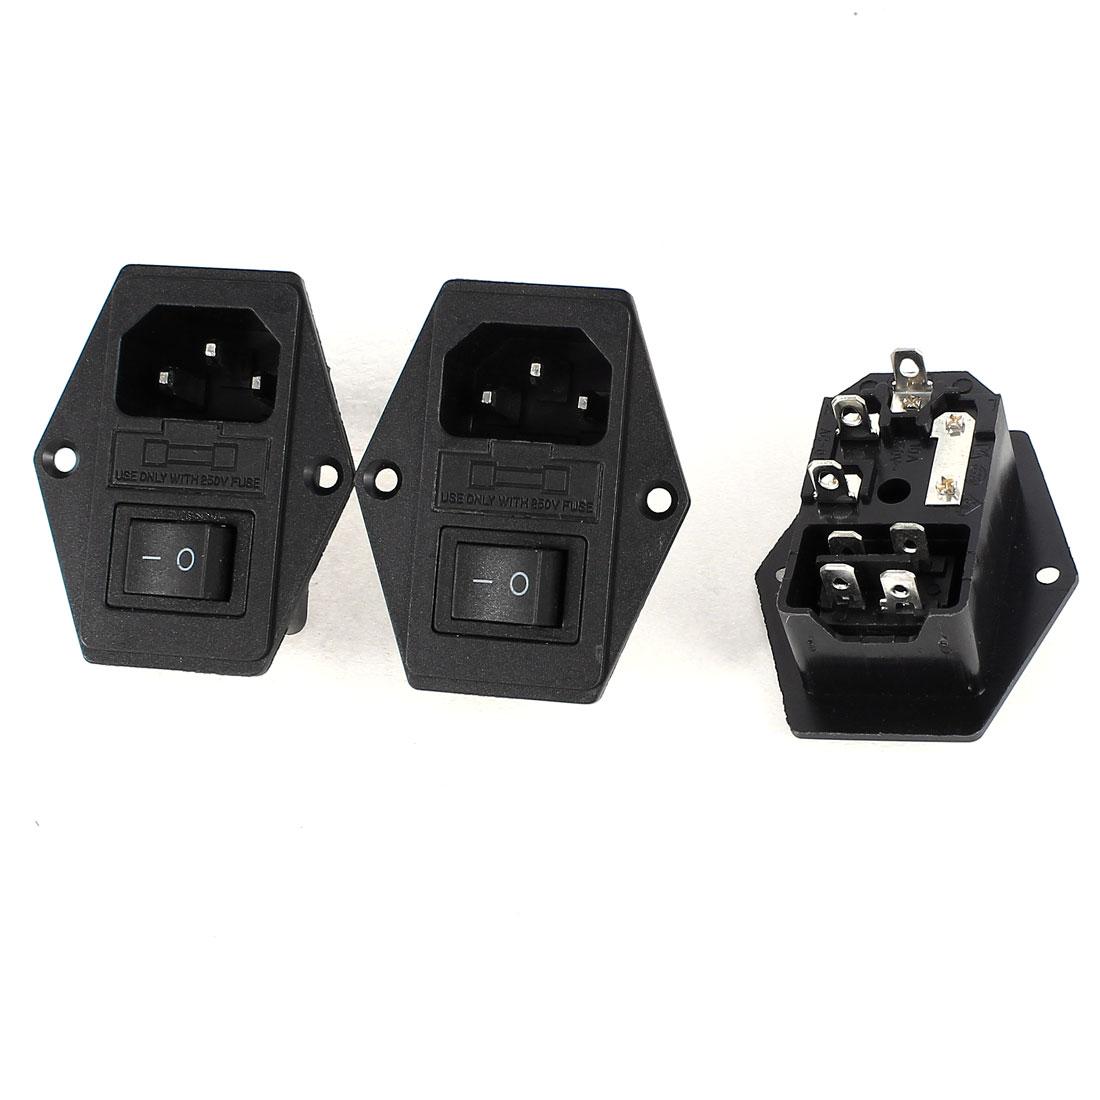 3 Pcs Panel Mount DPST Rocker Switch Fuse IEC320 C14 Inlet Power Socket AC 250V 5A